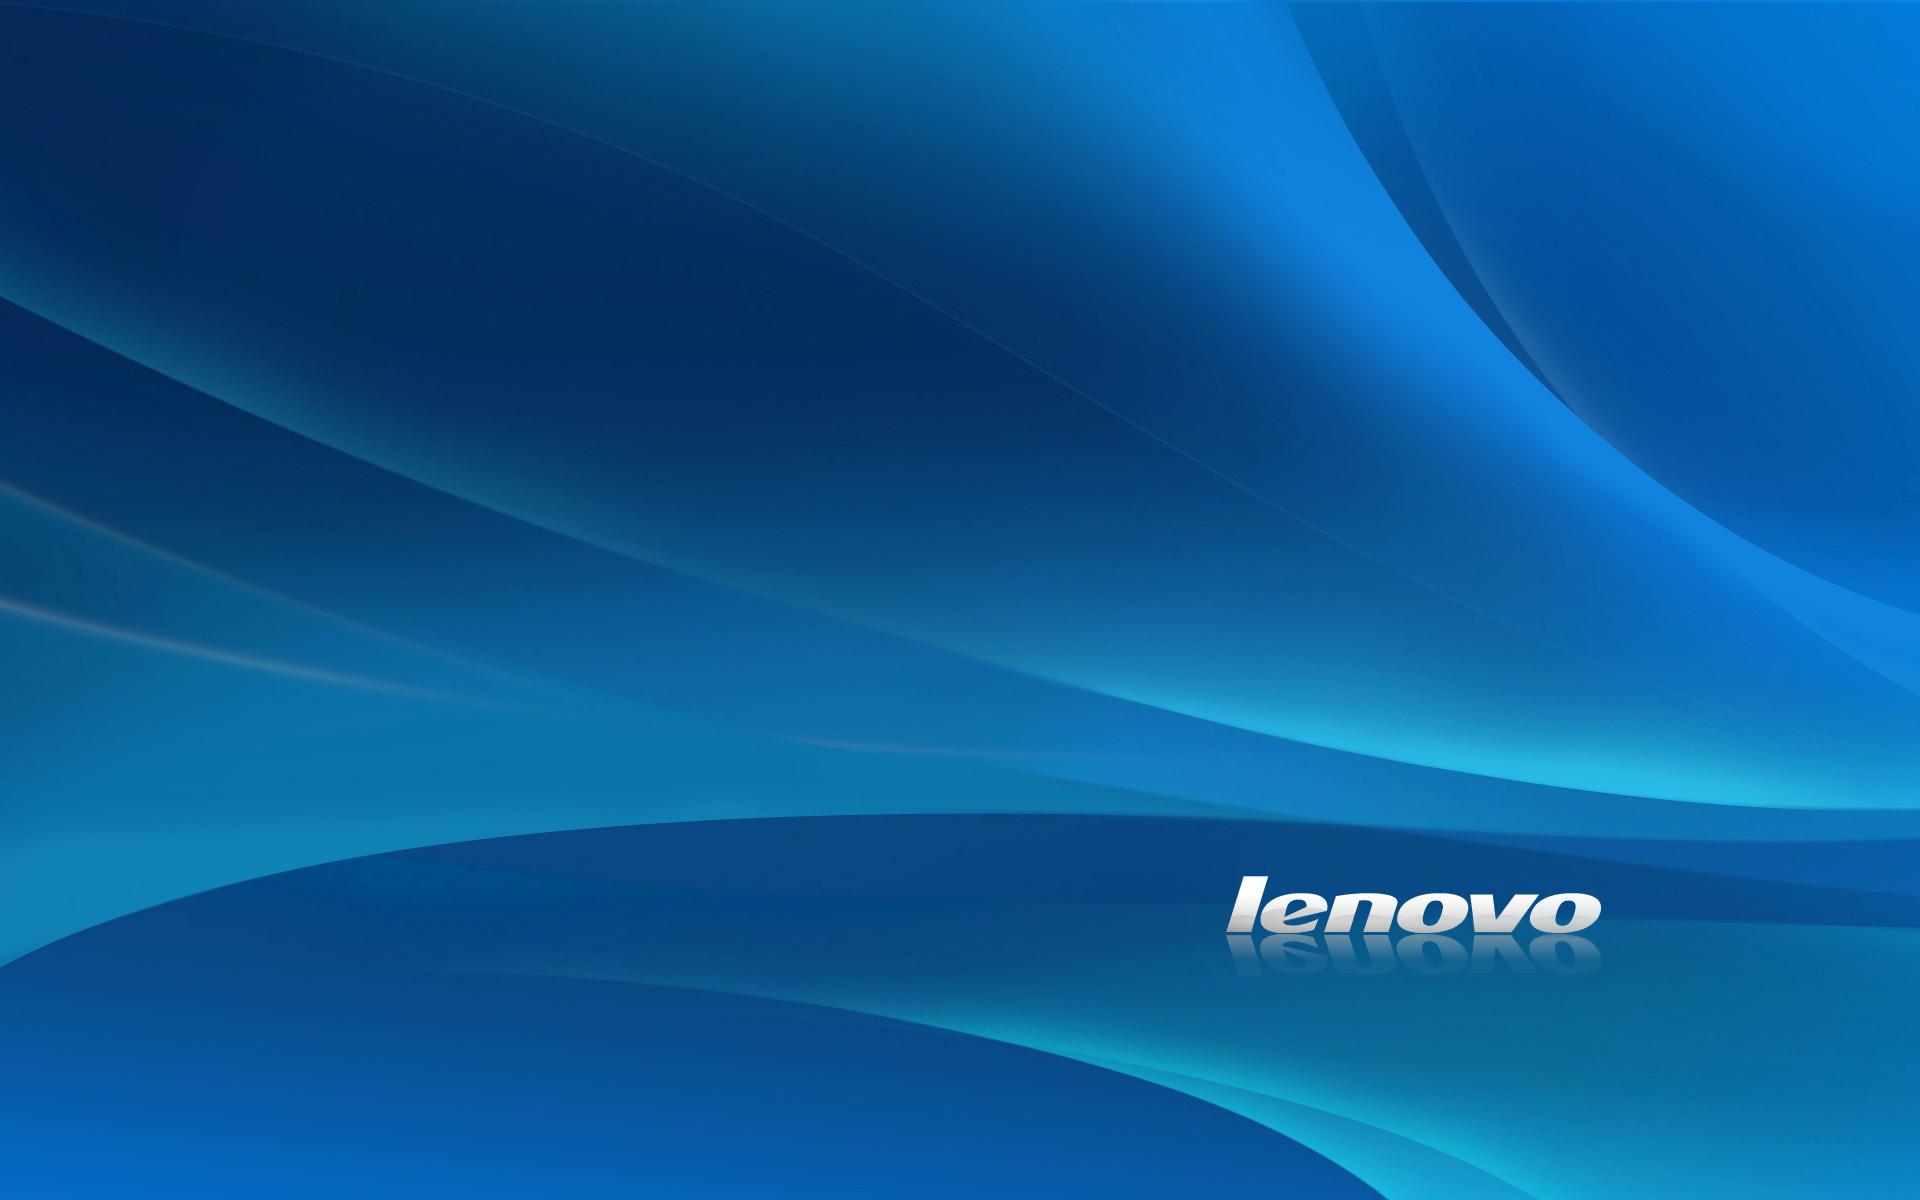 lenovo笔记本电脑壁纸打包下载 高清图片